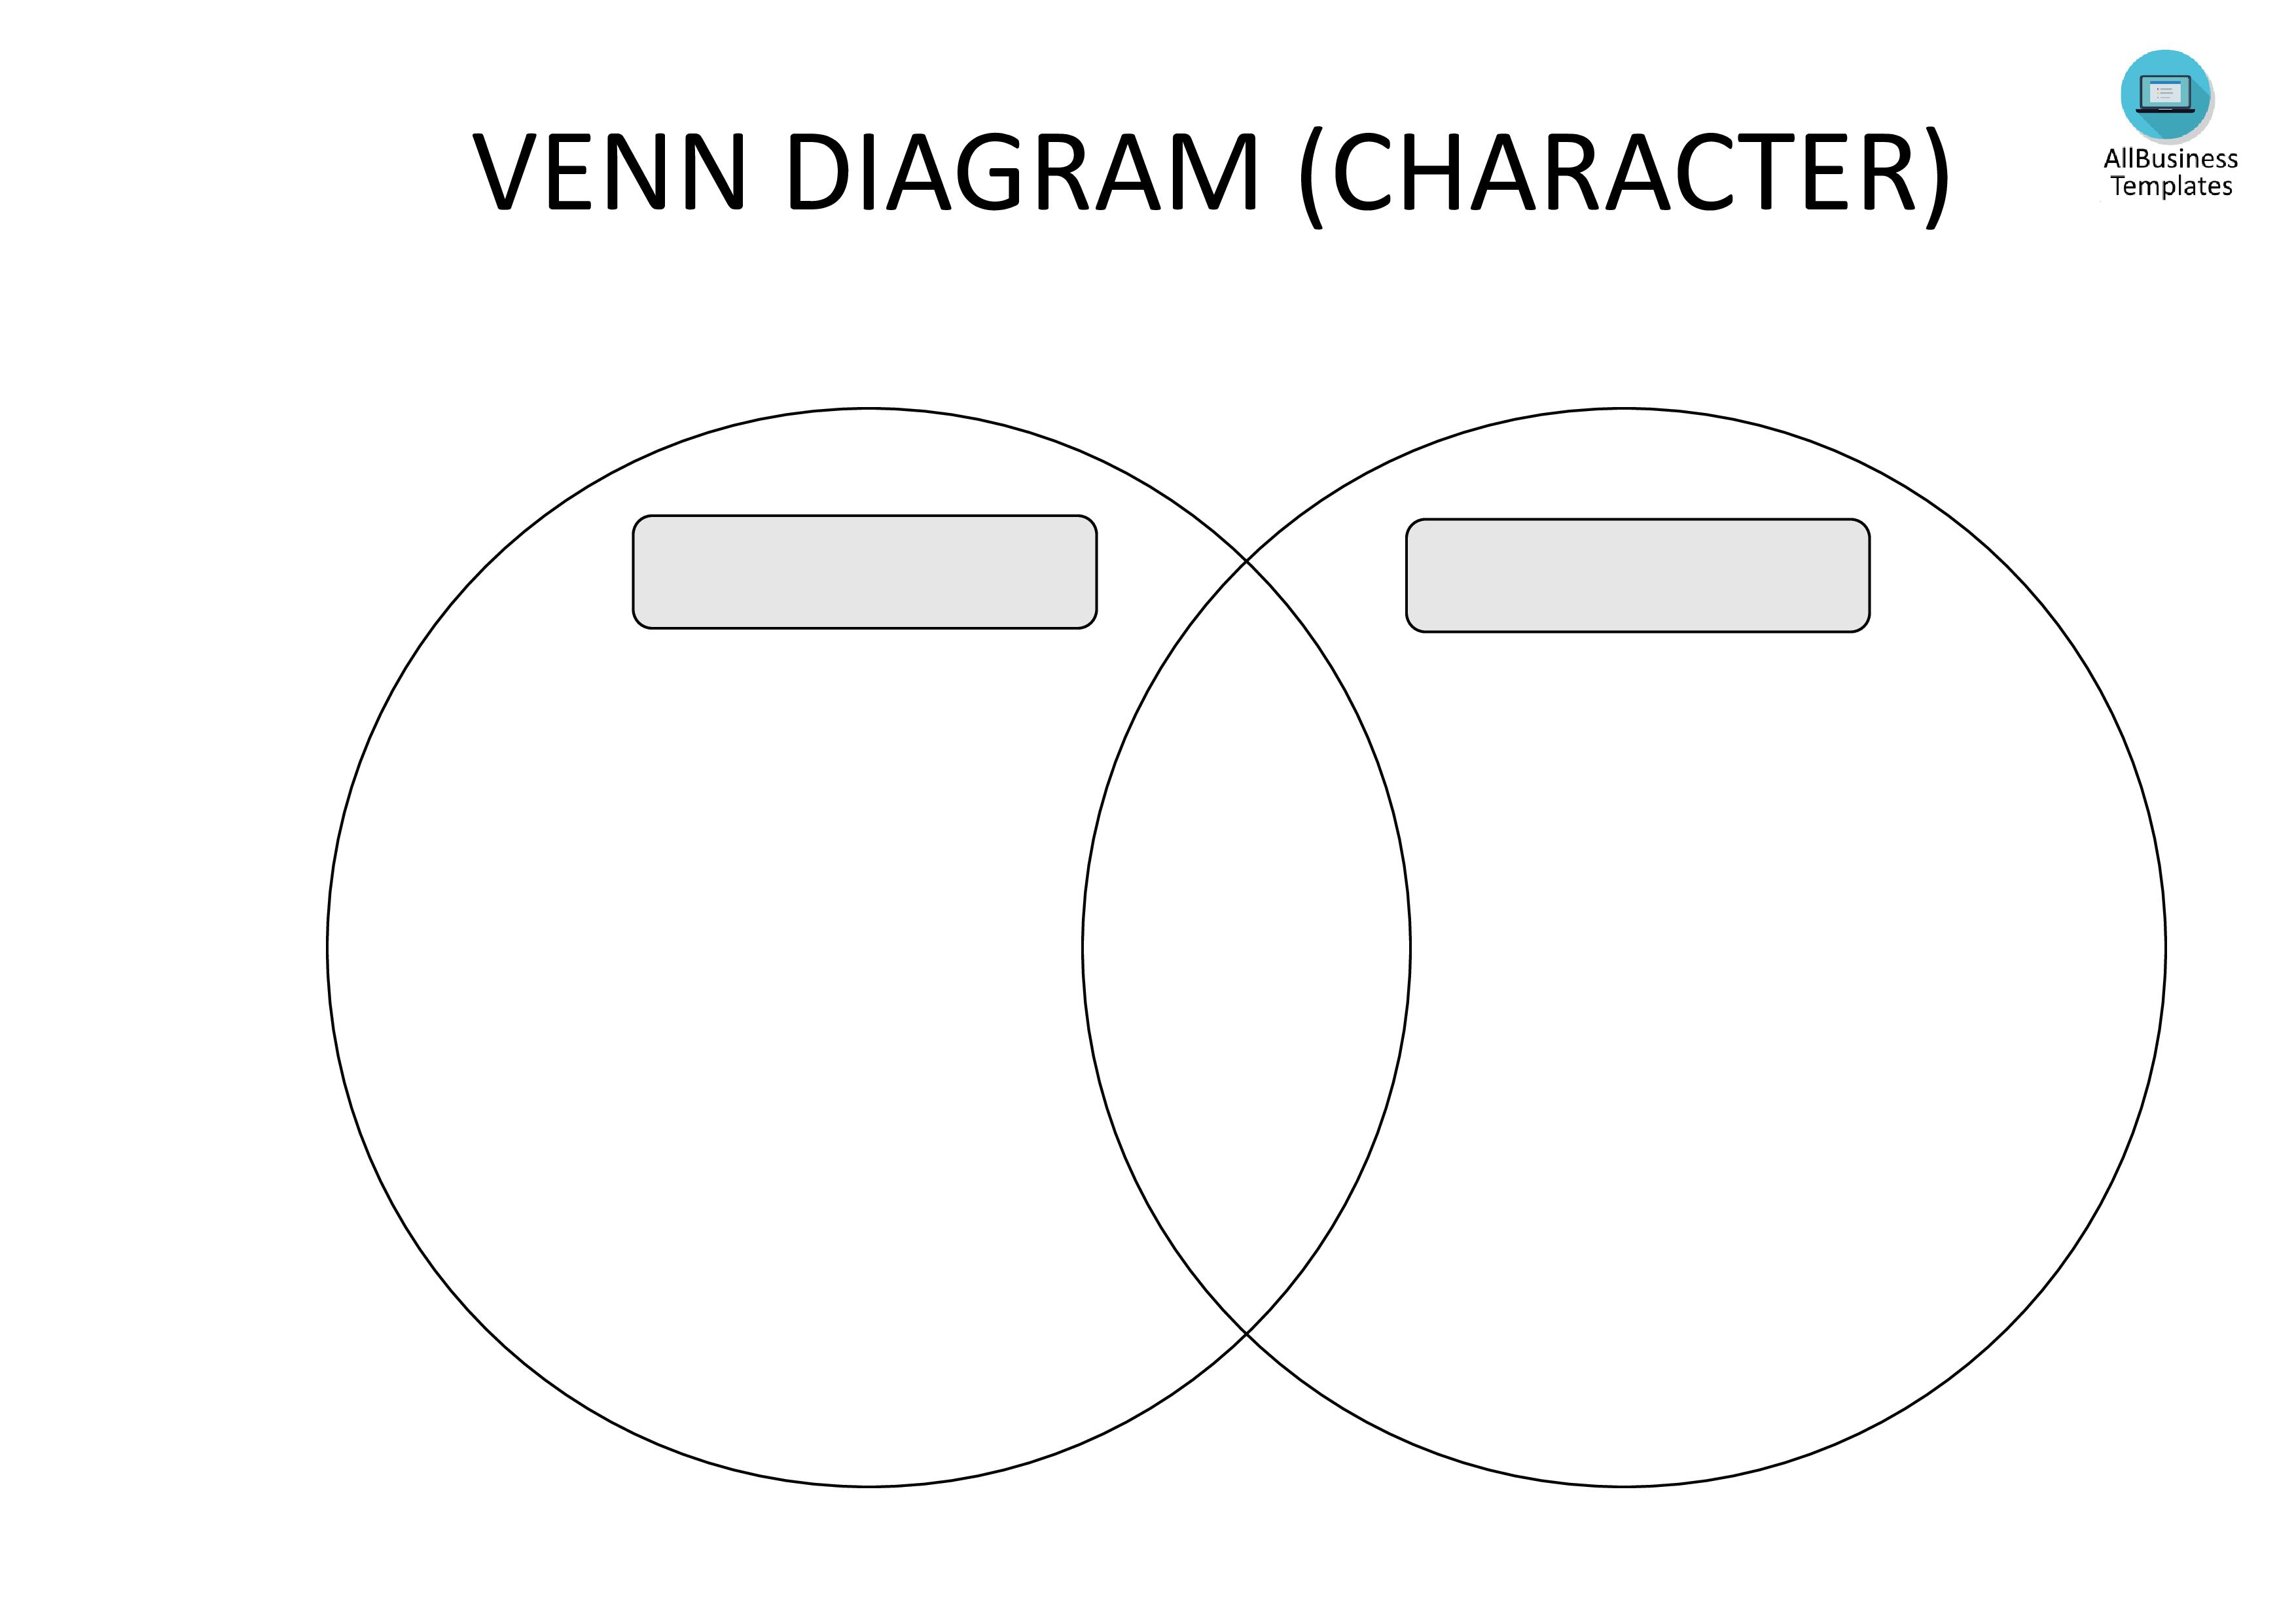 Free Blank Venn Diagram Template | Templates At - Free Printable Venn Diagram